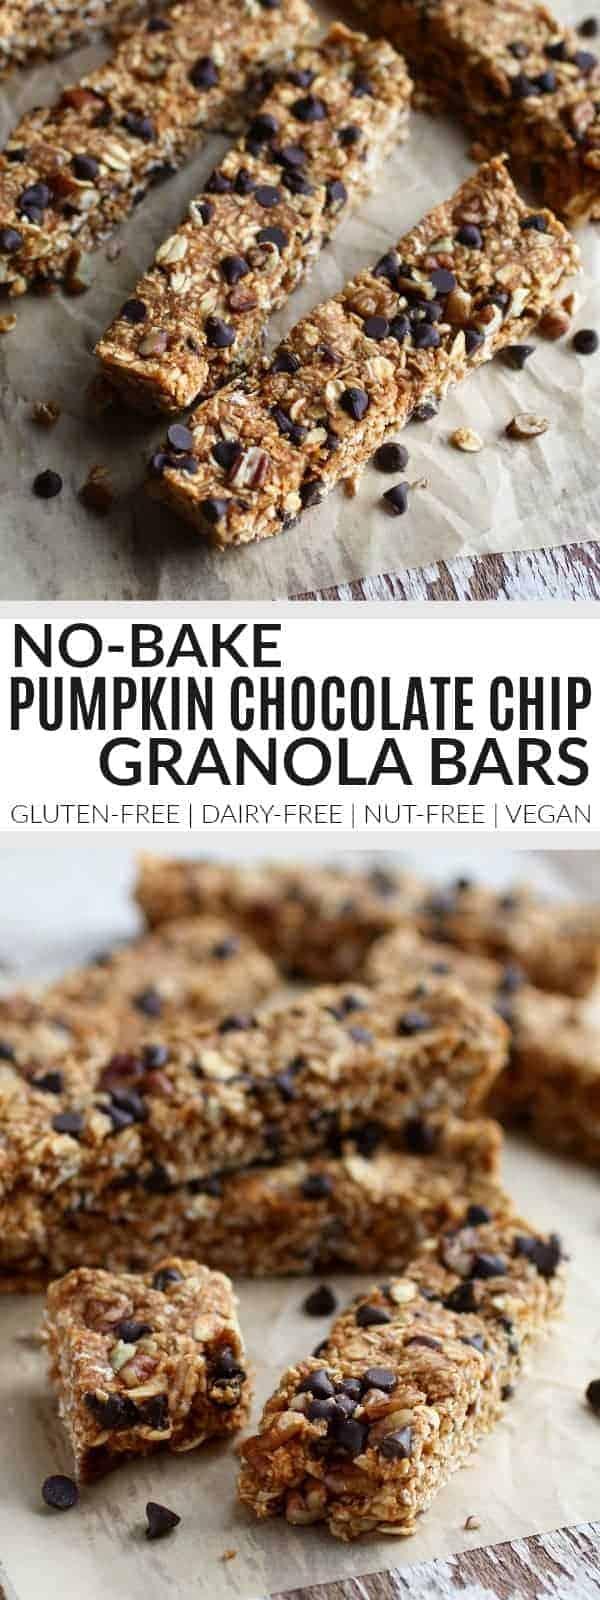 Pinterest image for No-Bake Pumpkin Chocolate Chip Granola Bars